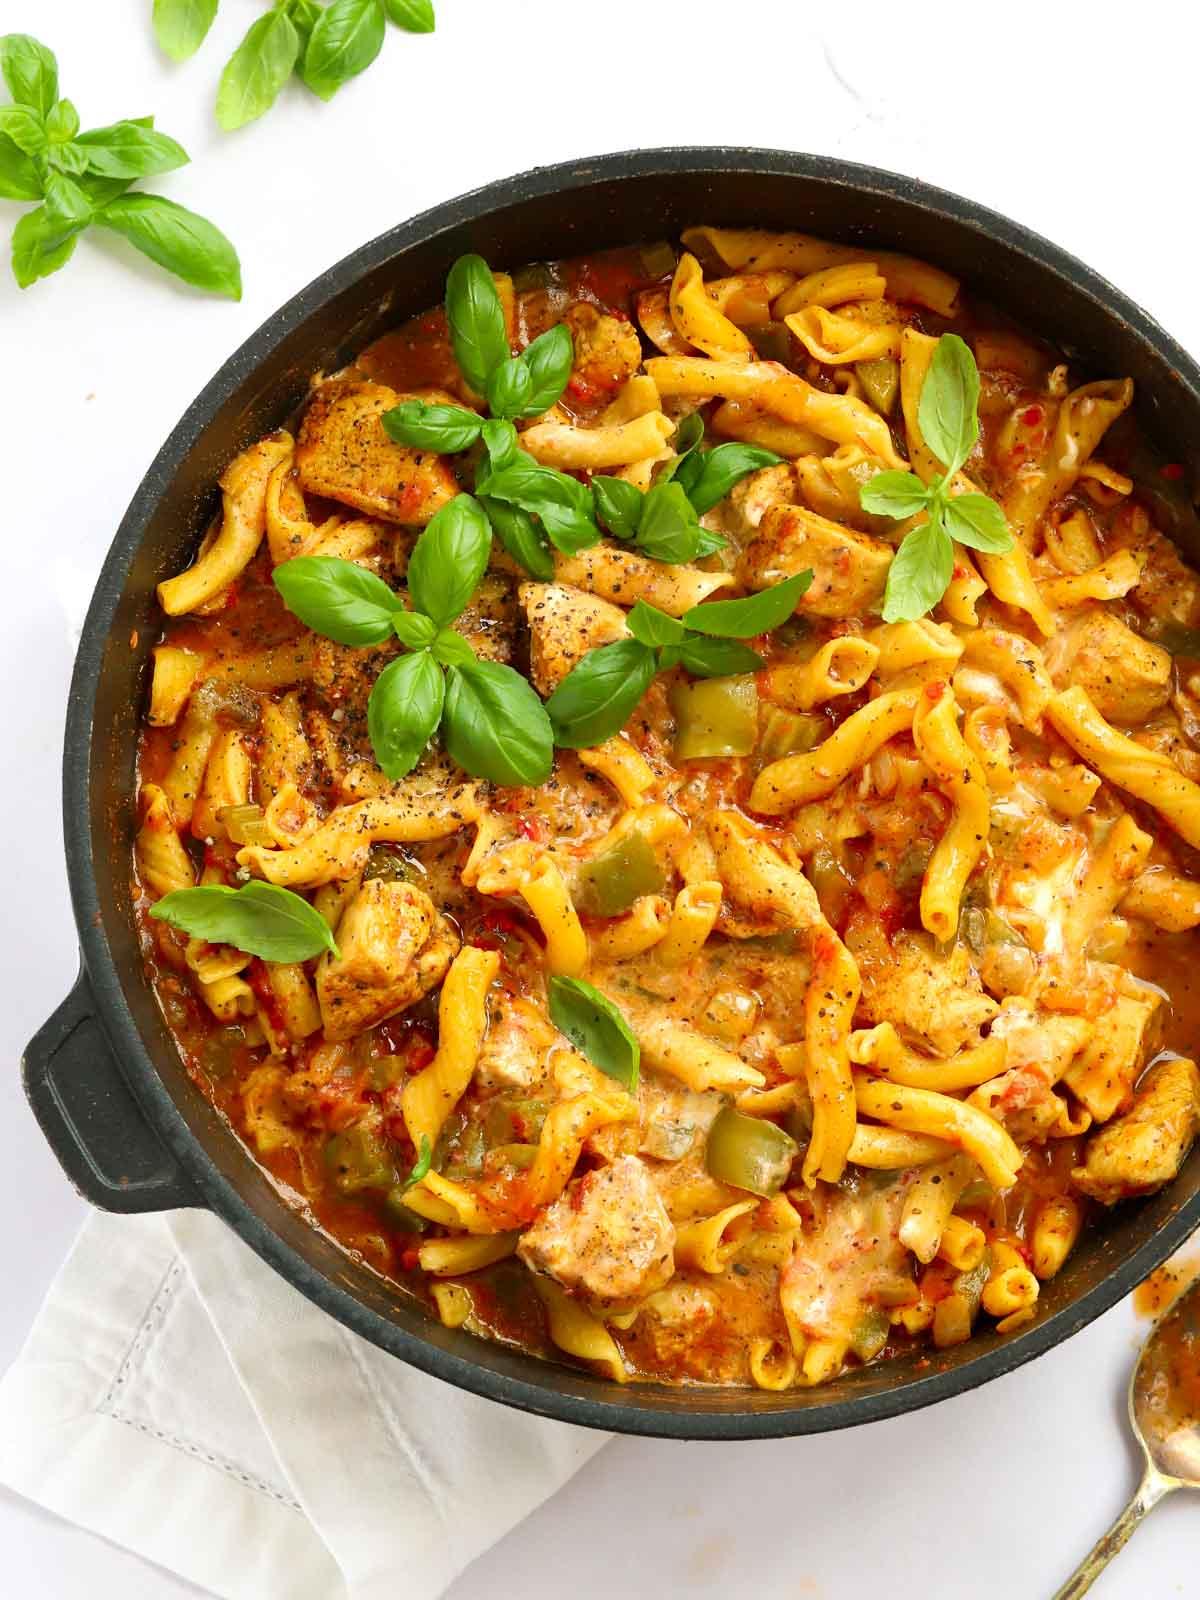 Cajun chicken pasta recipe made in one pot in under 30 minutes